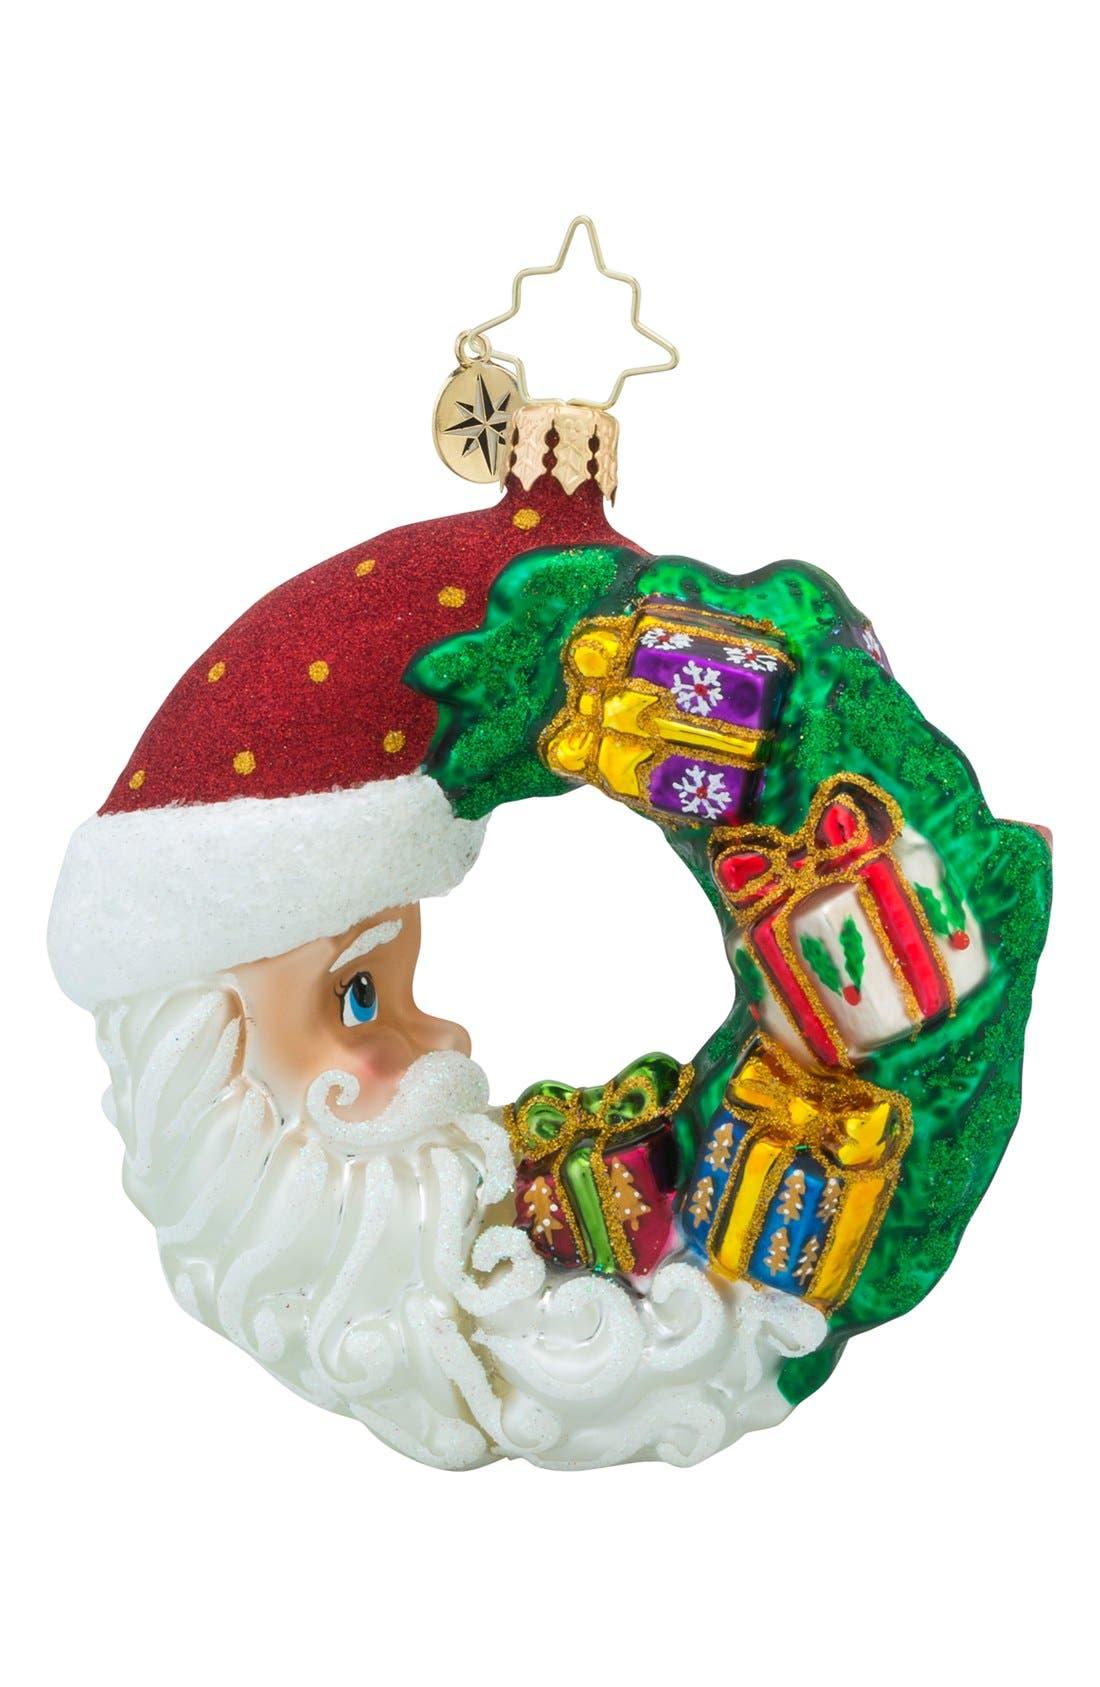 Christopher Radko 'Crescent Christmas' Santa Ornament